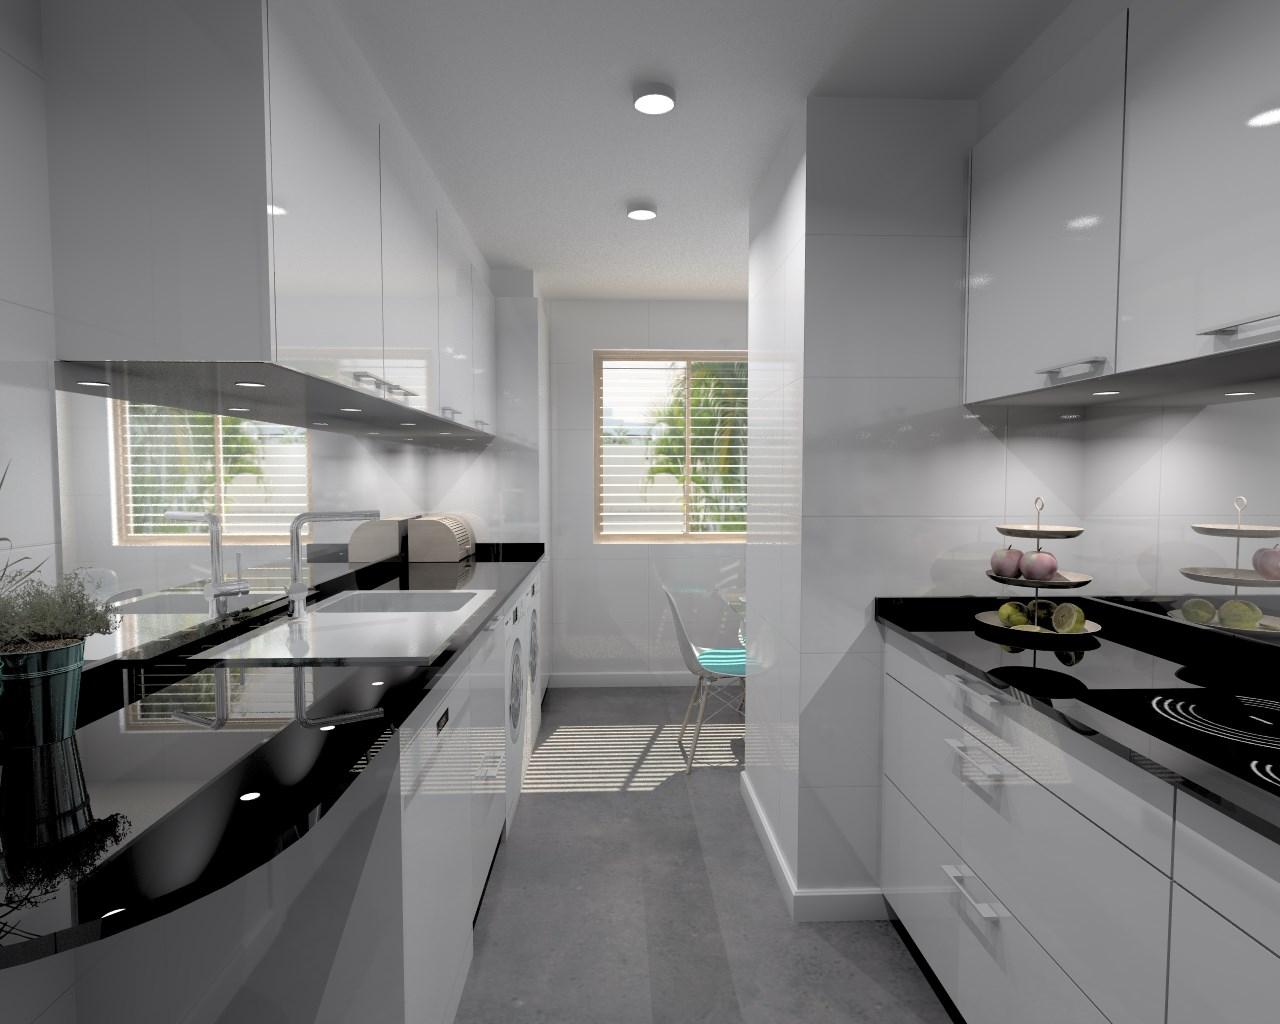 modelo plano laminado blanco brillo encimera granito negro